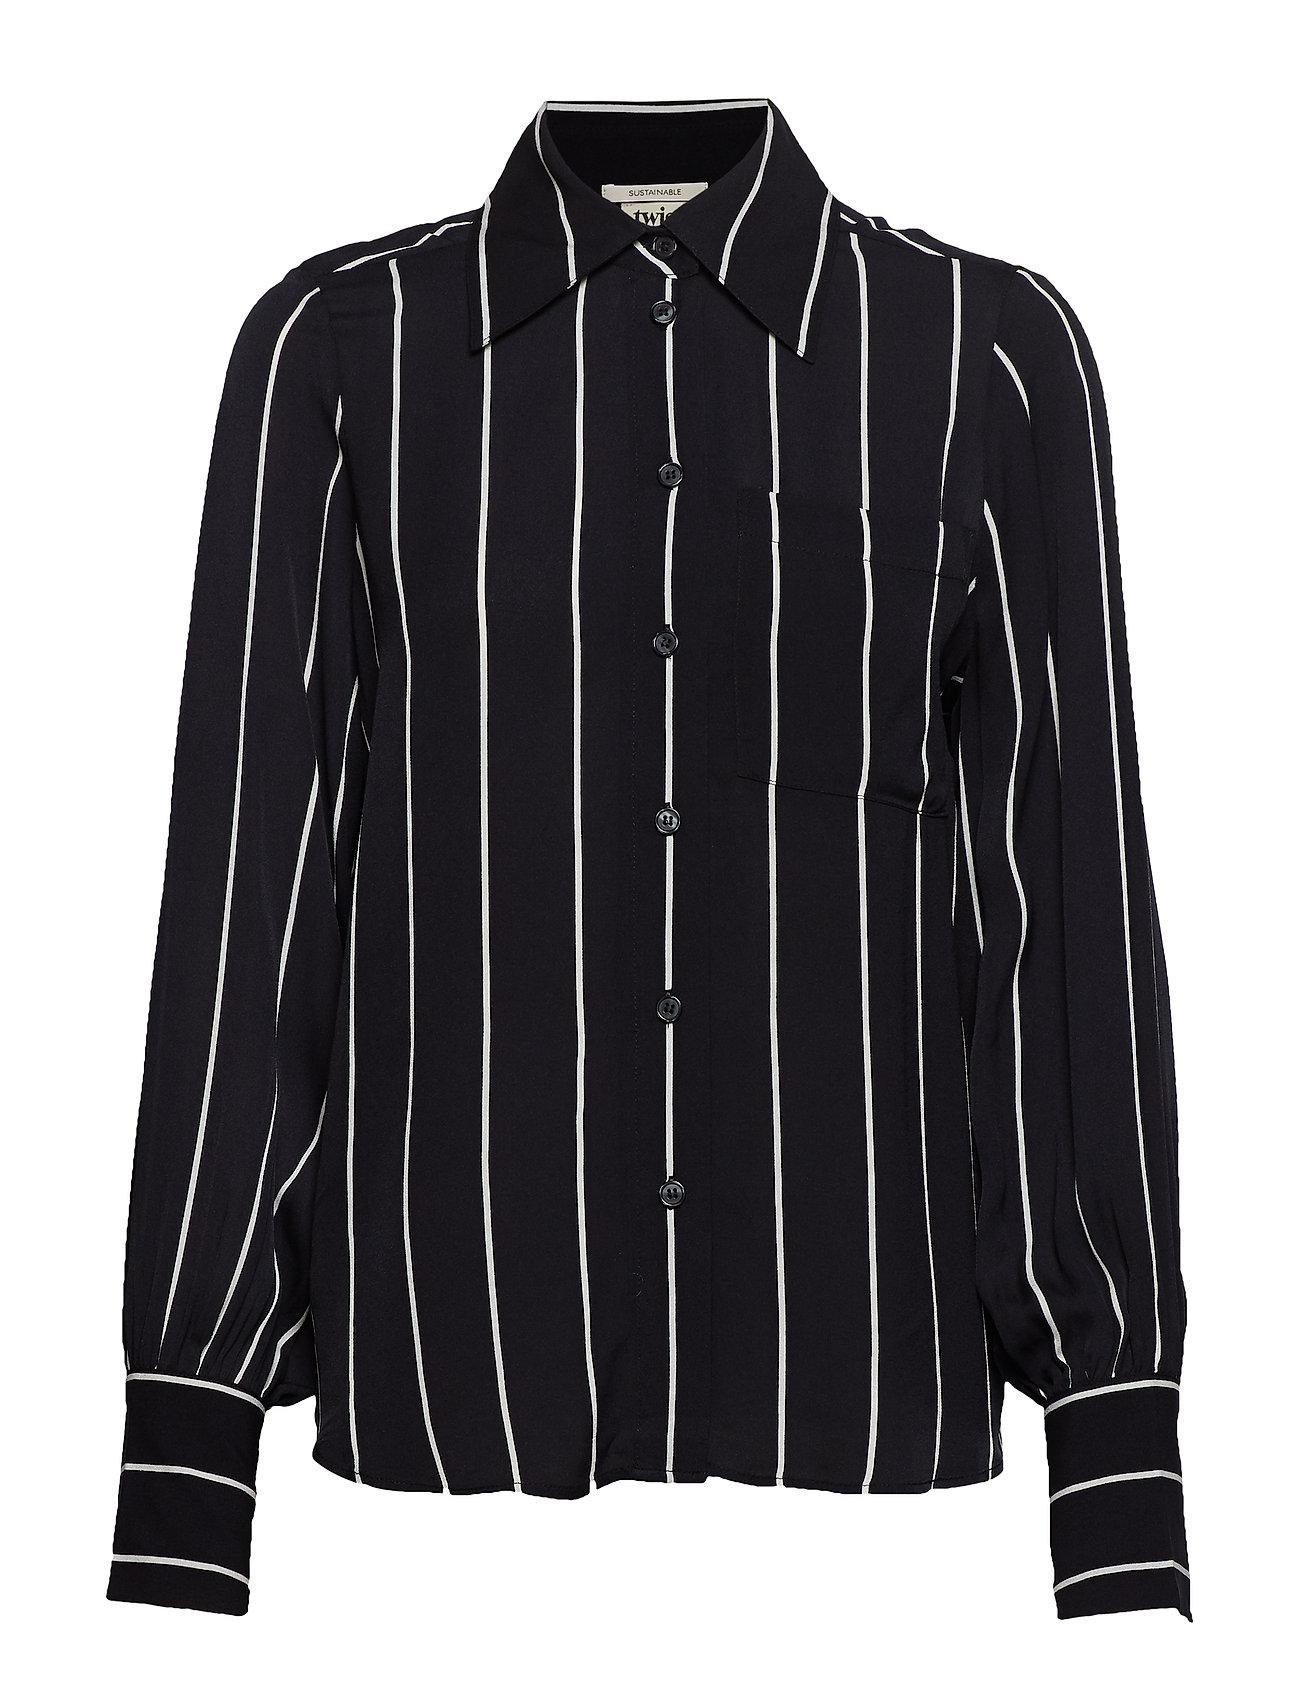 Twist & Tango My Shirt - BLACK STRIPE